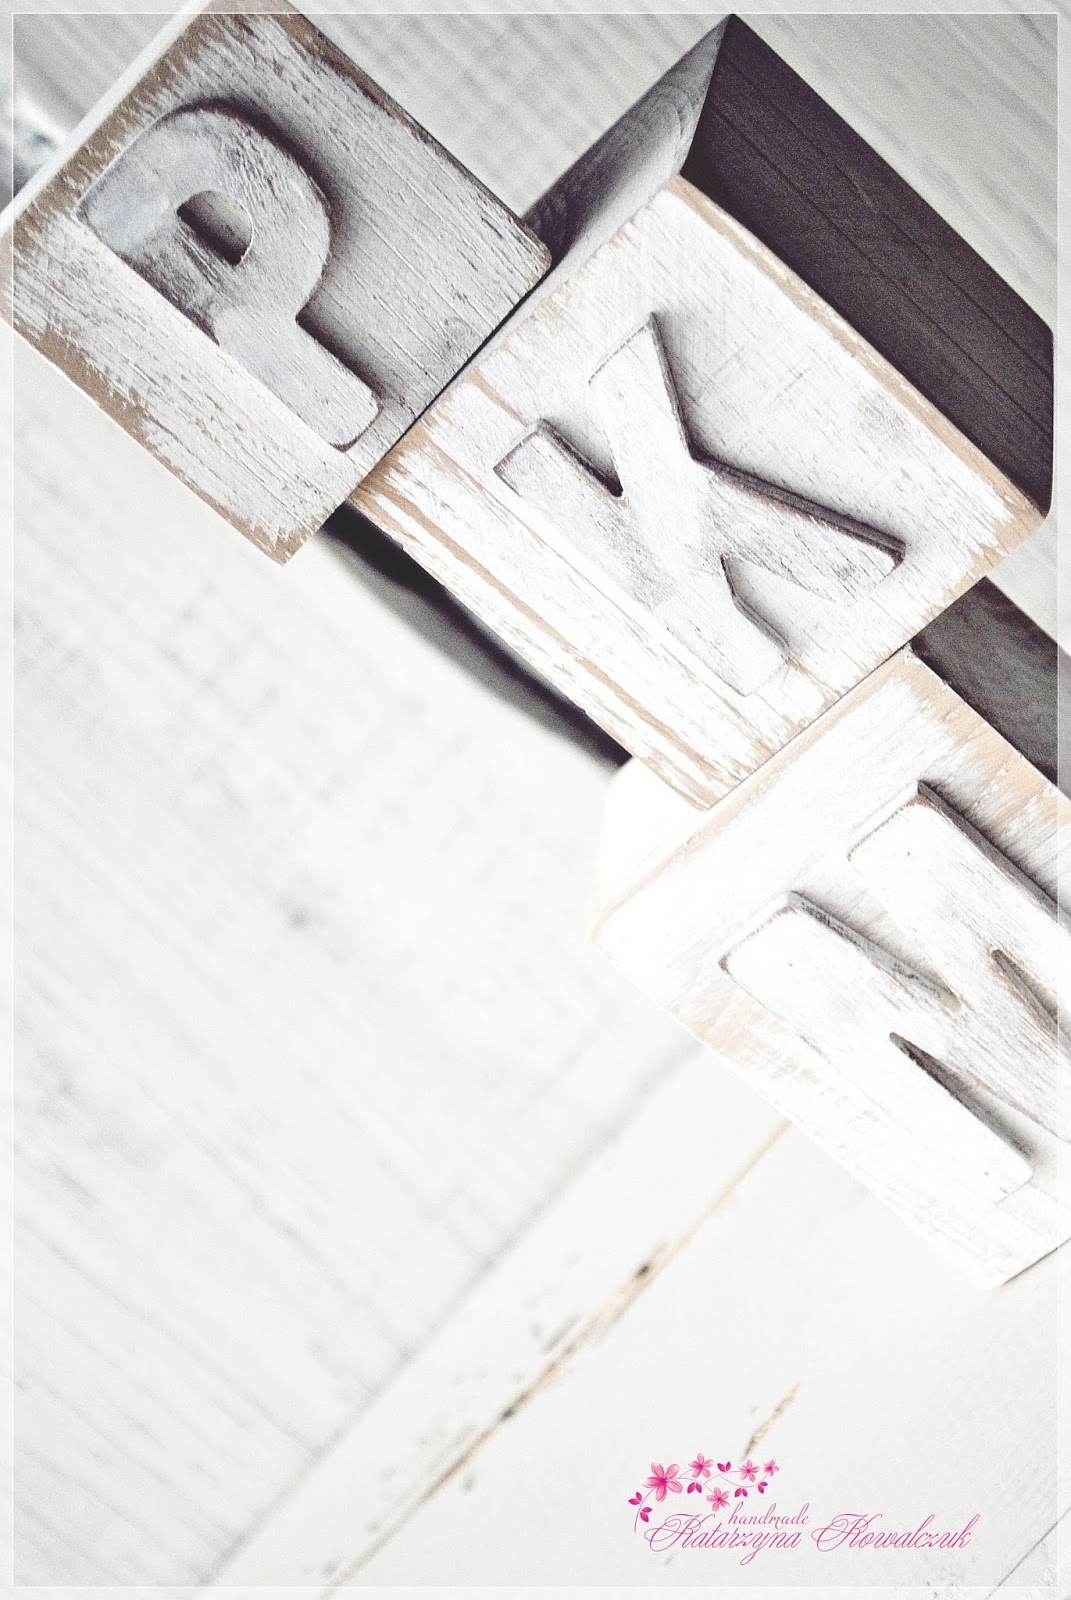 drewniane klocki z kiterami shabby chic